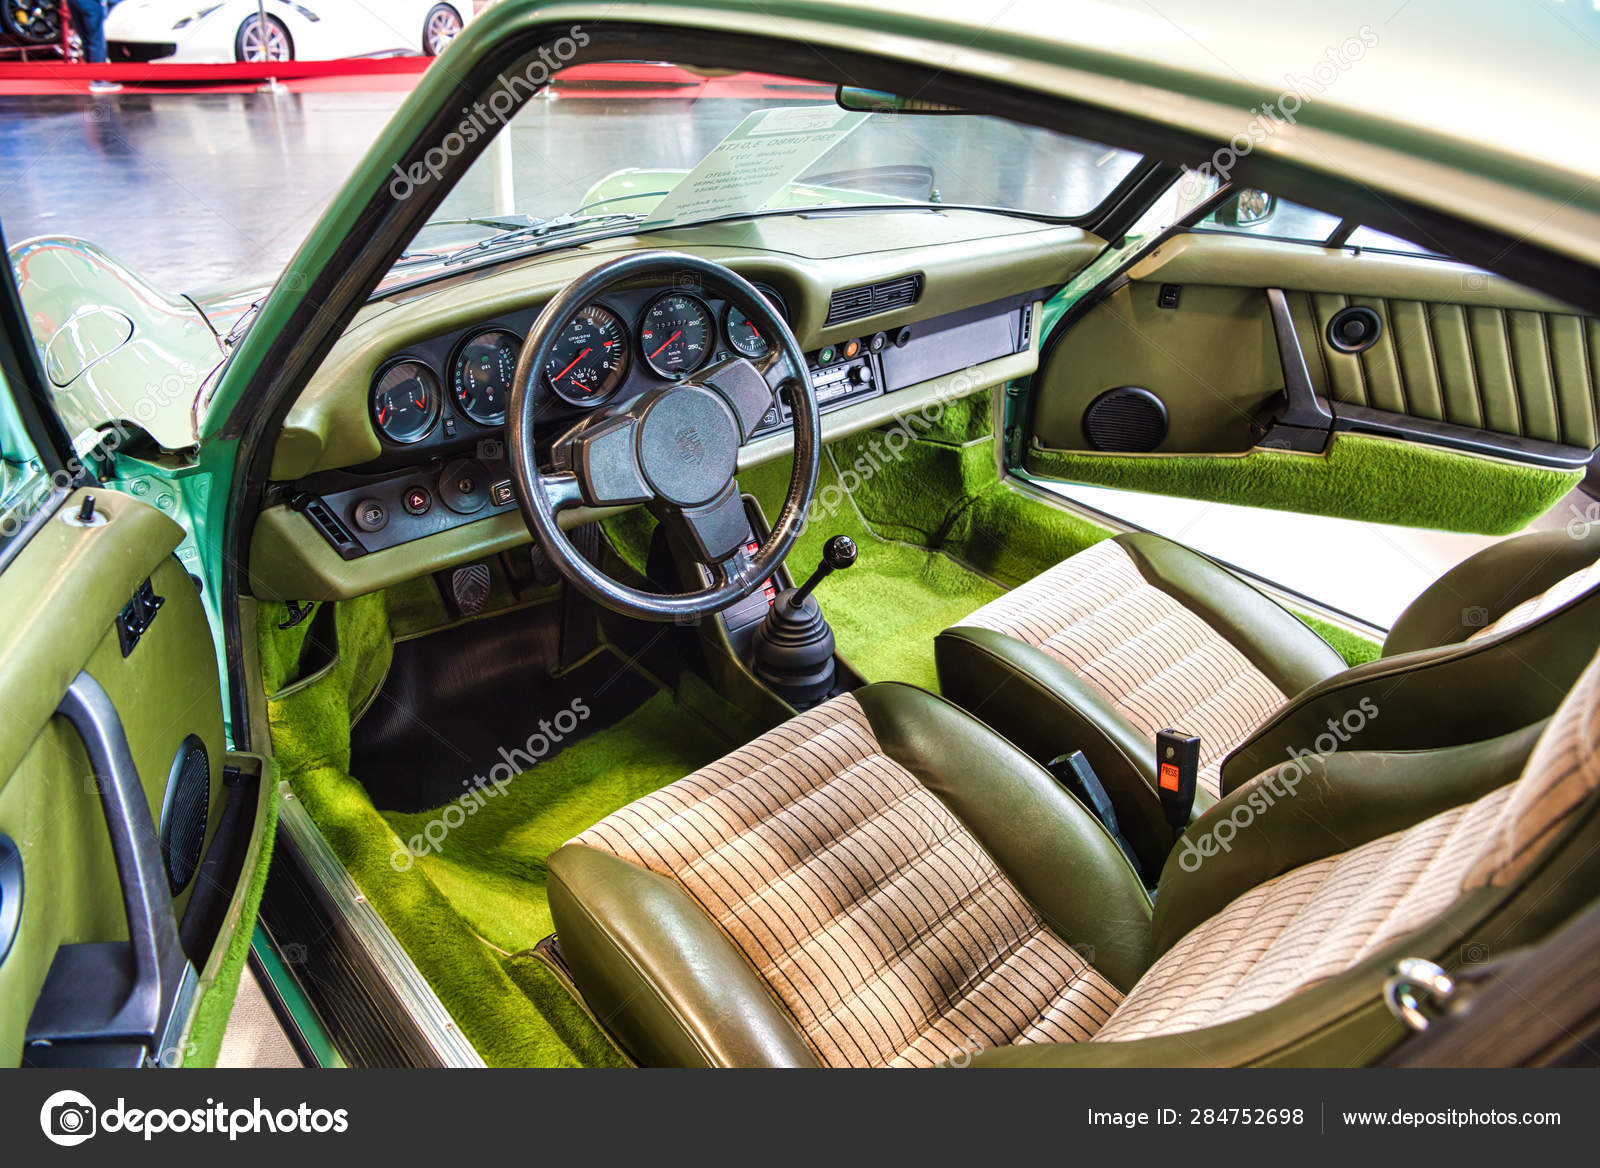 Friedrichshafen May 2019 Green Interior Of Porsche 911 930 964 Carrera 4 1990 Cabrio At Motorworld Classics Bodensee On May 11 2019 In Friedrichshafen Germany Stock Editorial Photo C Eagle2308 284752698